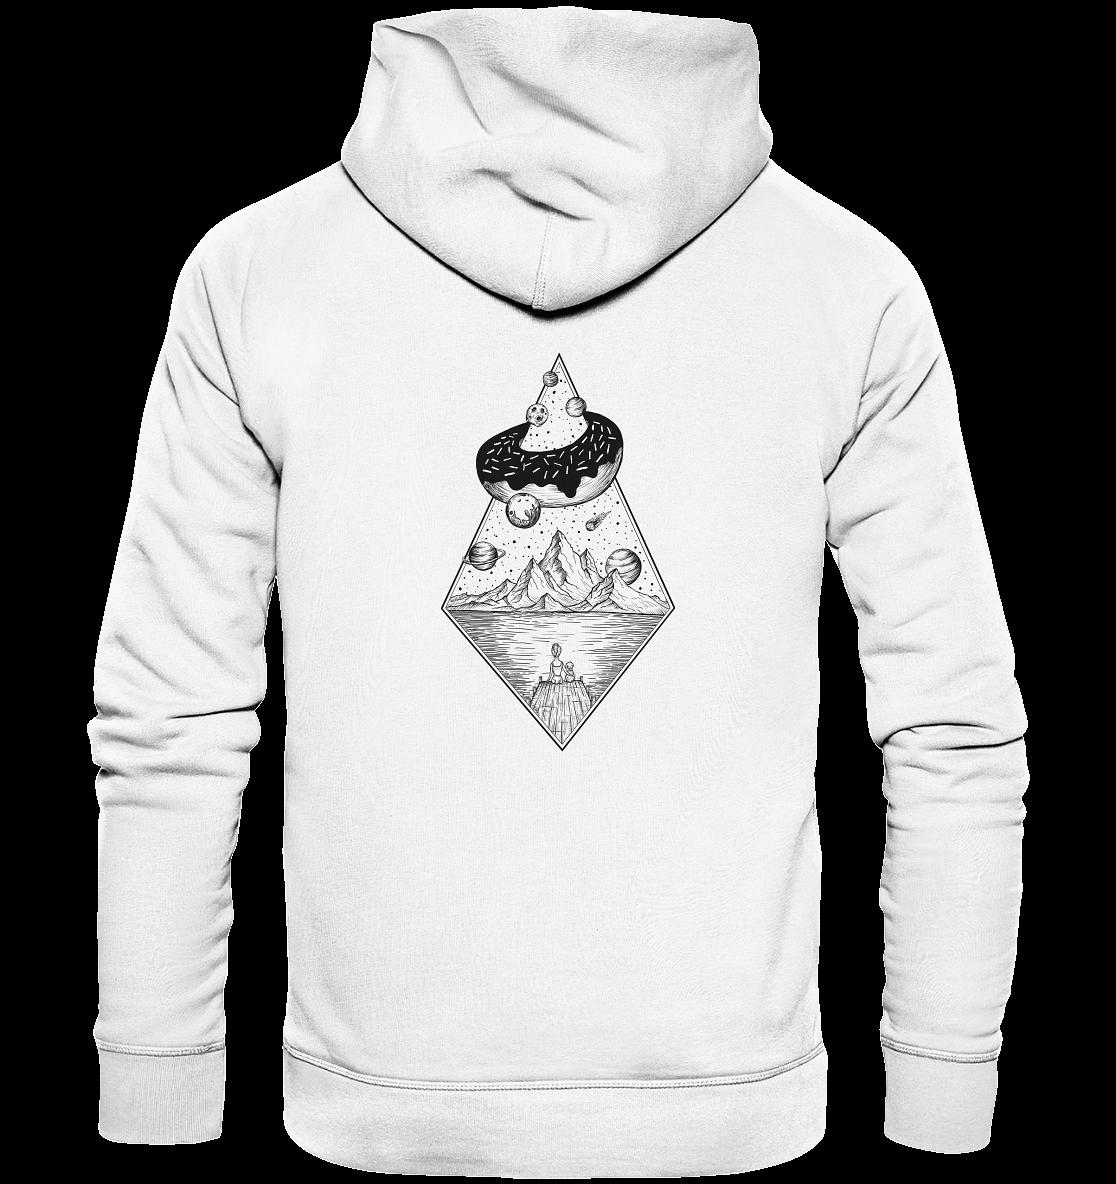 back-organic-hoodie-f8f8f8-1116x.png